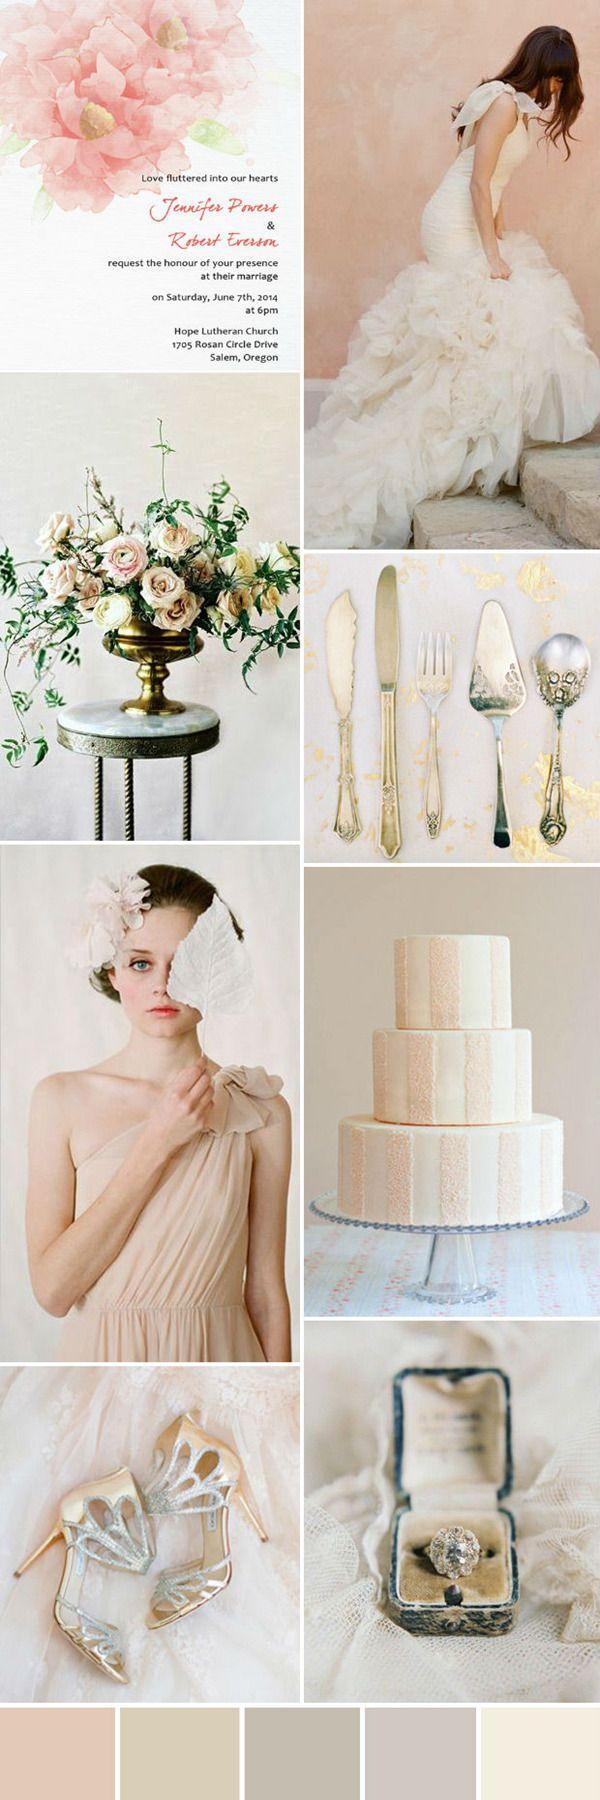 63 best Wedding Color Palettes images on Pinterest | Wedding colors ...